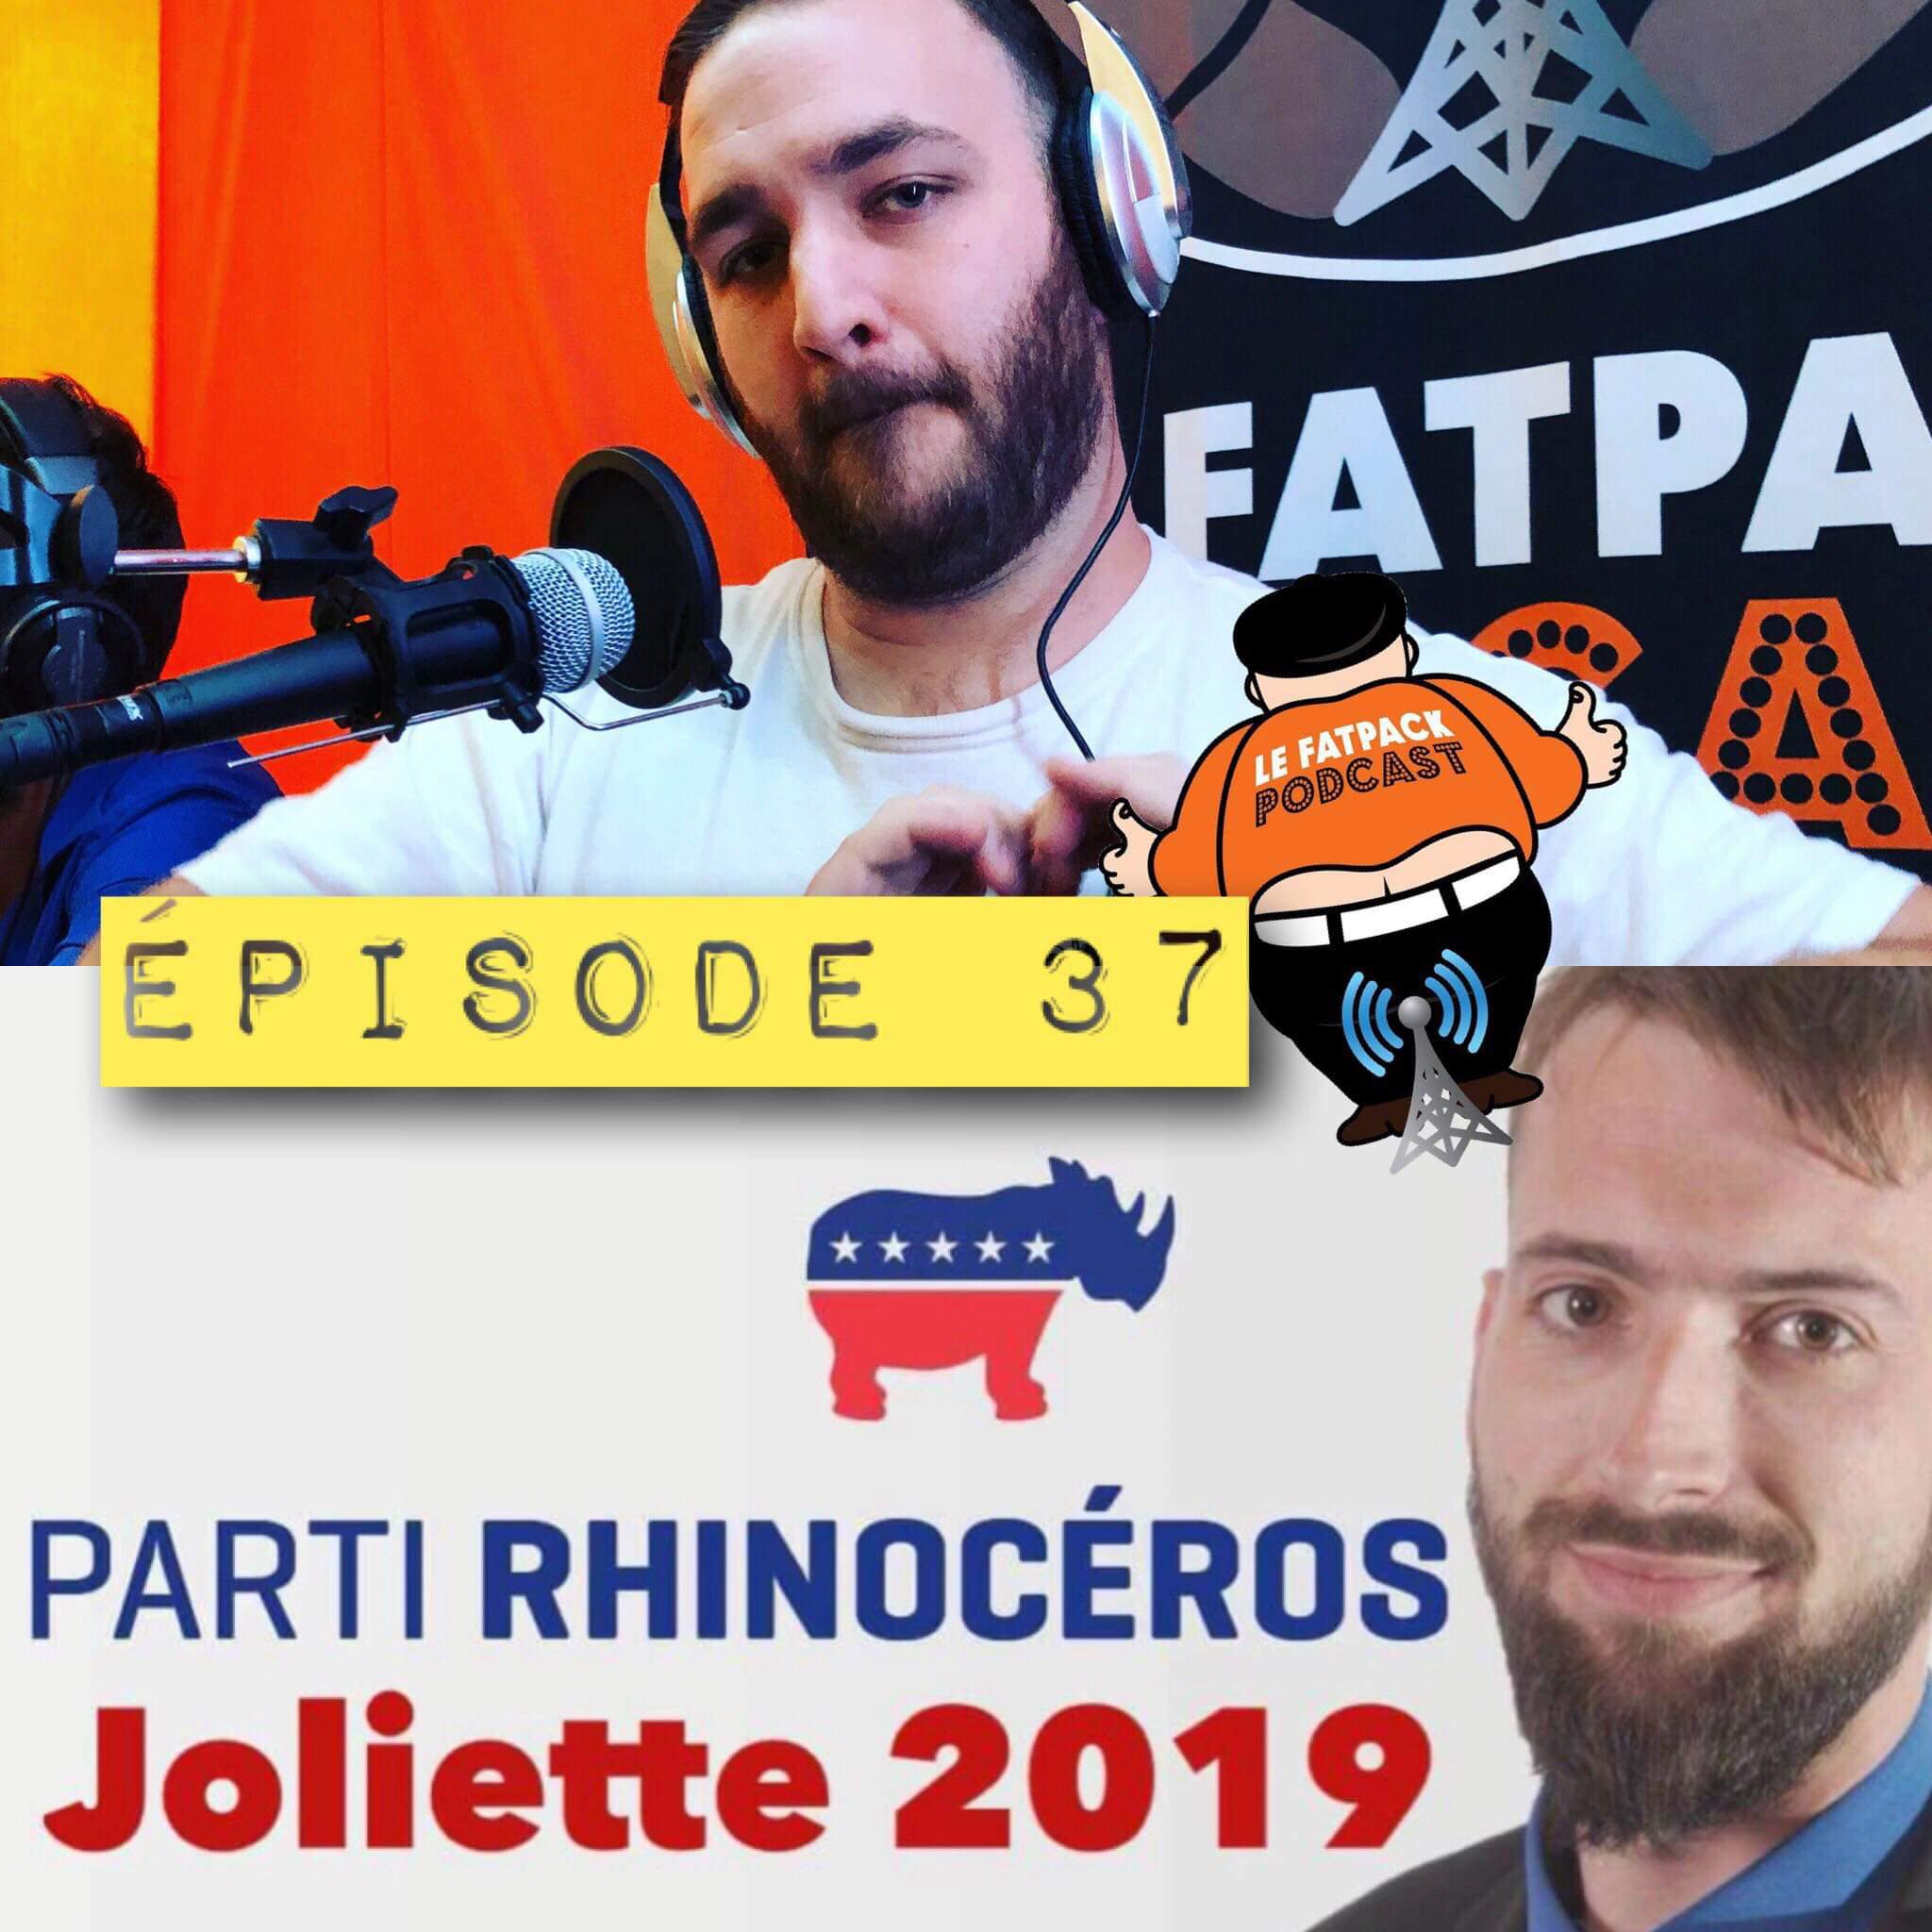 FatPack #37 – Rhino Jacques du Parti Rhinocéros